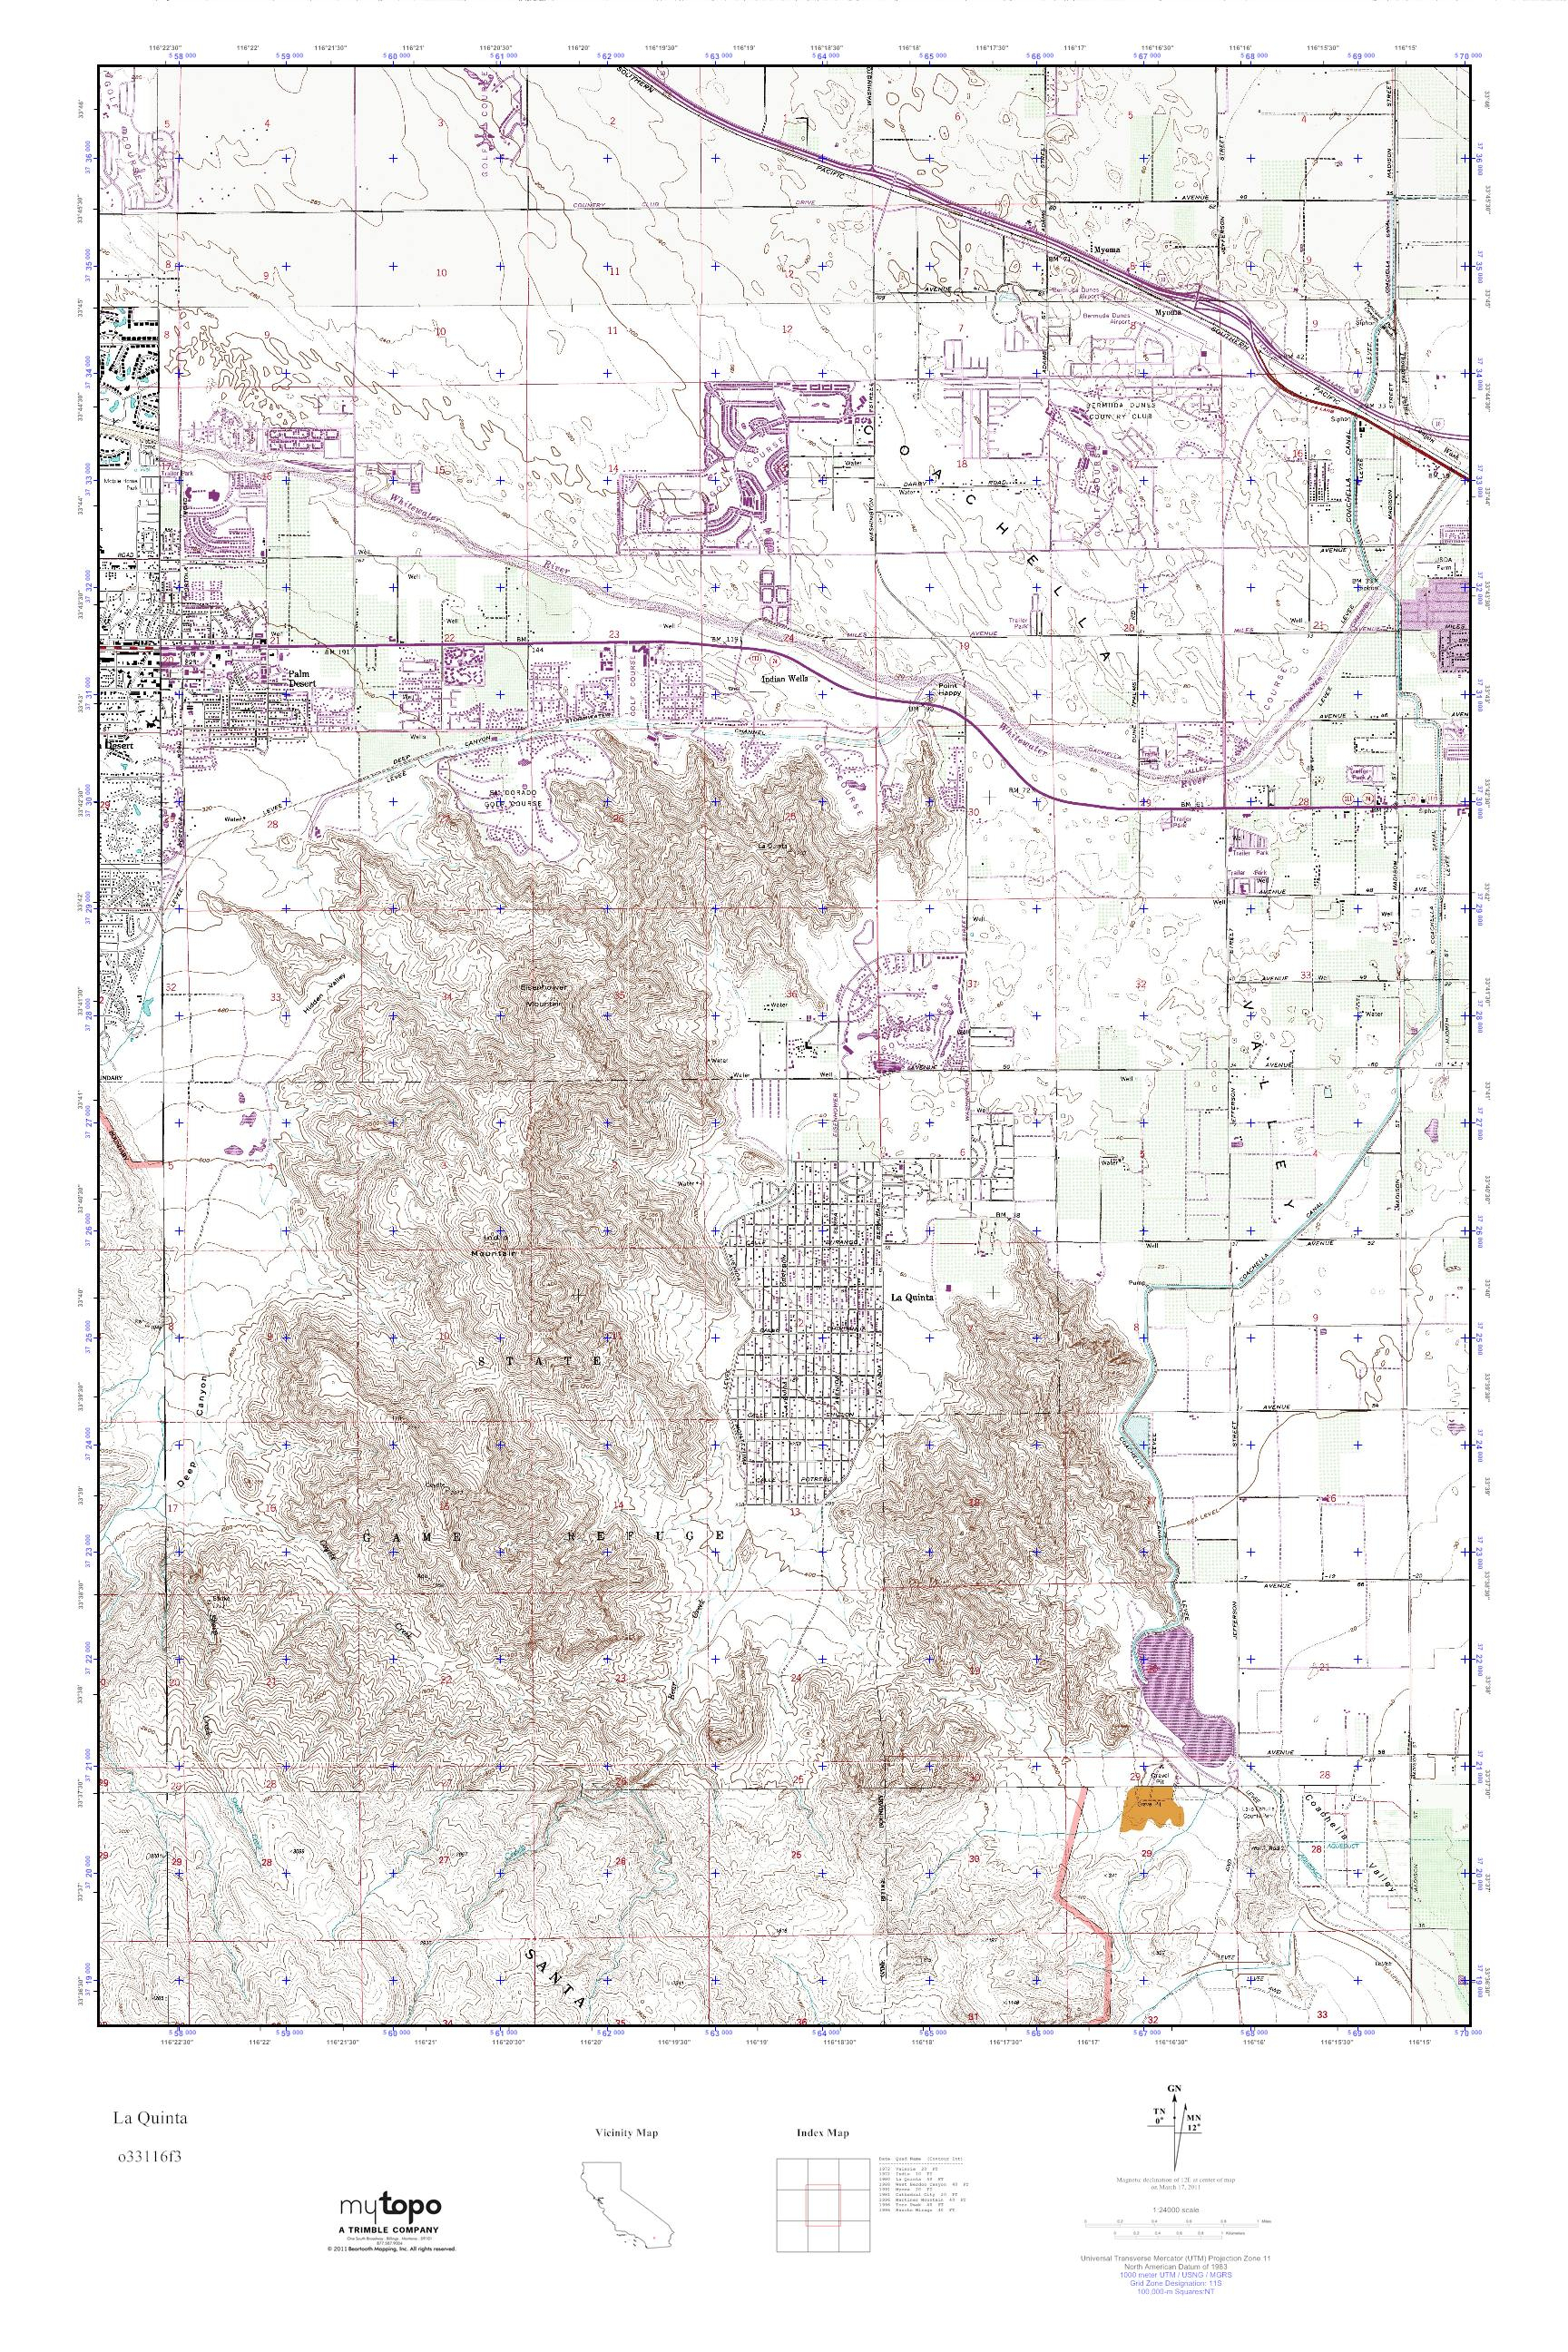 Mytopo La Quinta California Usgs Quad Topo Map And - Touran - La Quinta California Map